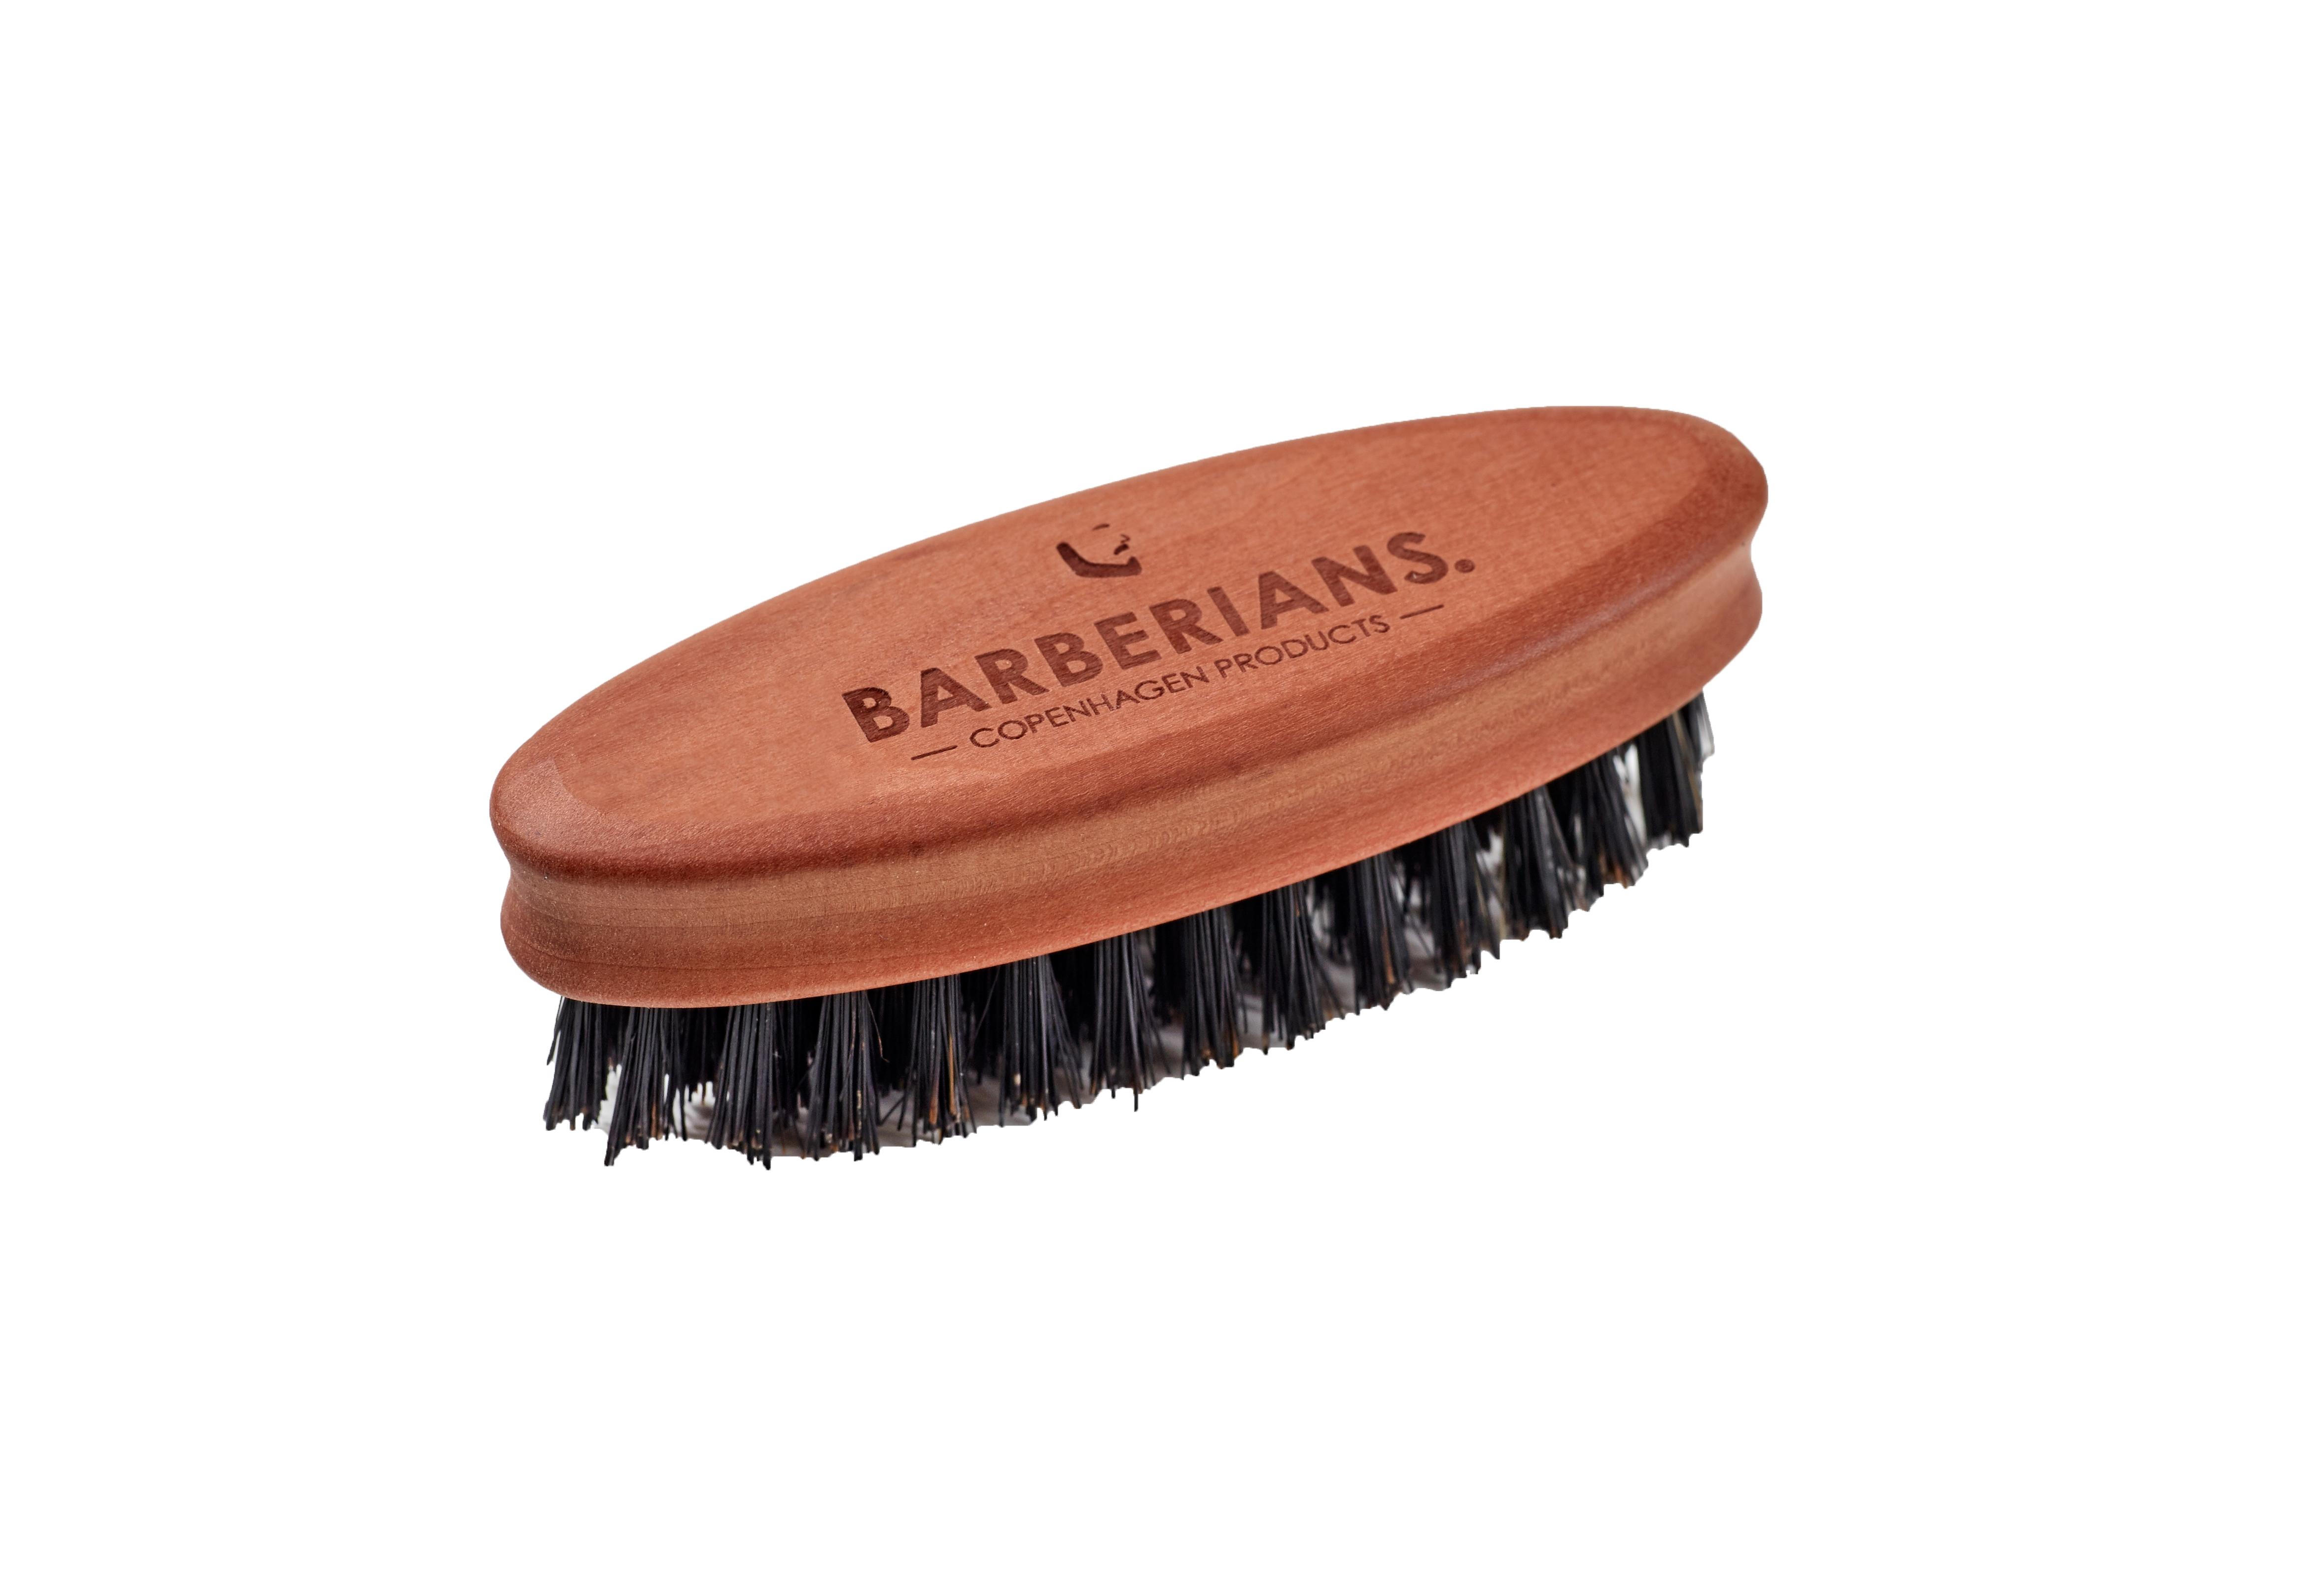 Barberians Oval Beard Brush